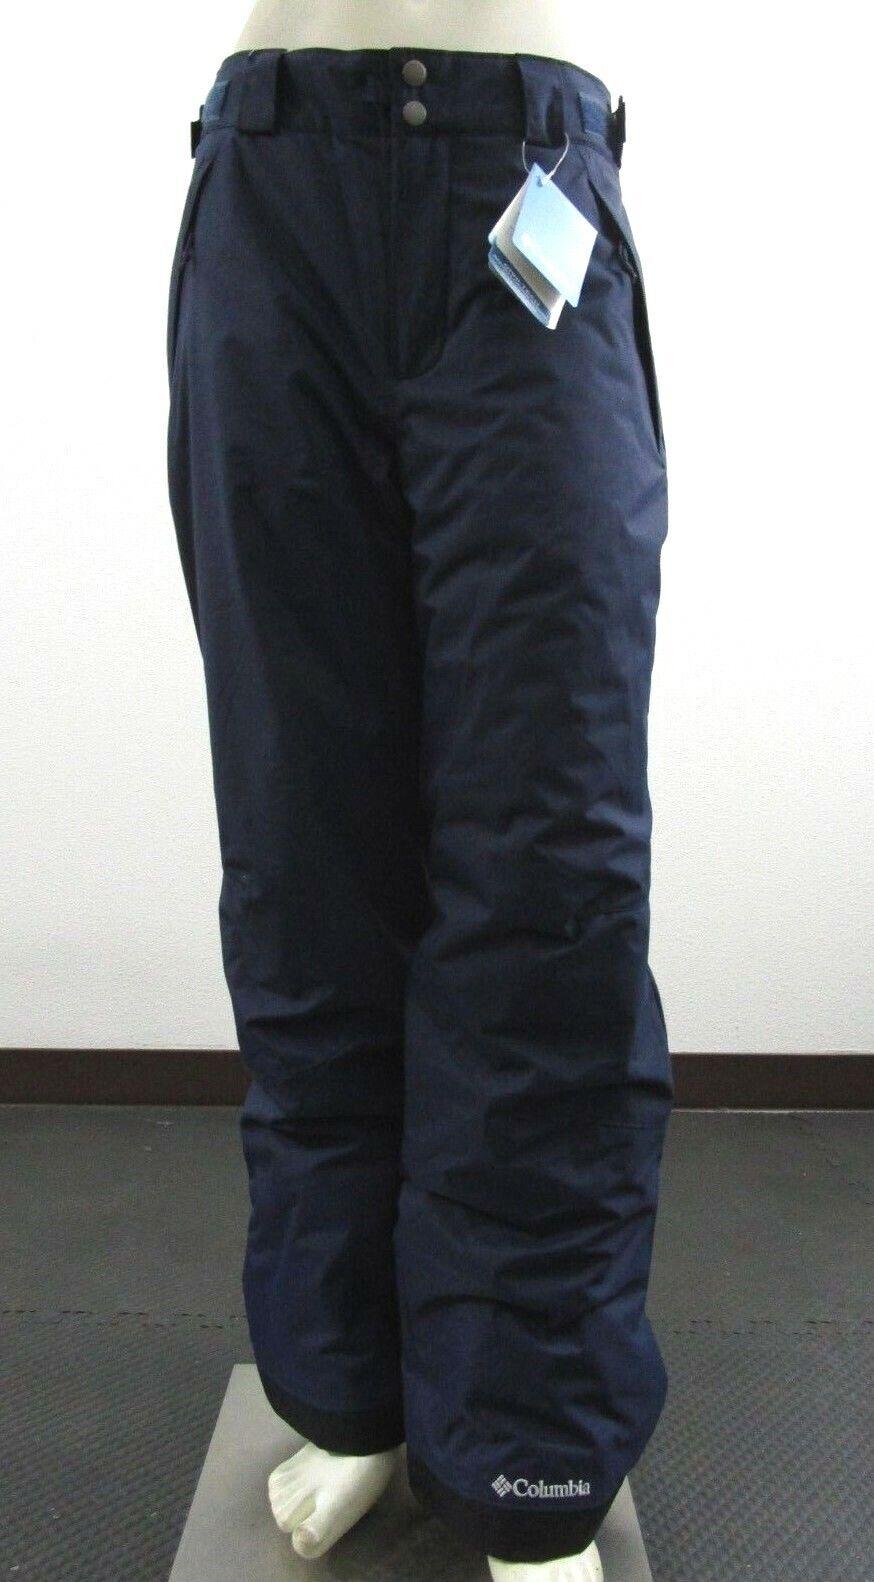 NWT Mens Columbia Arctic Trip OH Insulated Waterproof Snow Ski Pants - Navy bluee